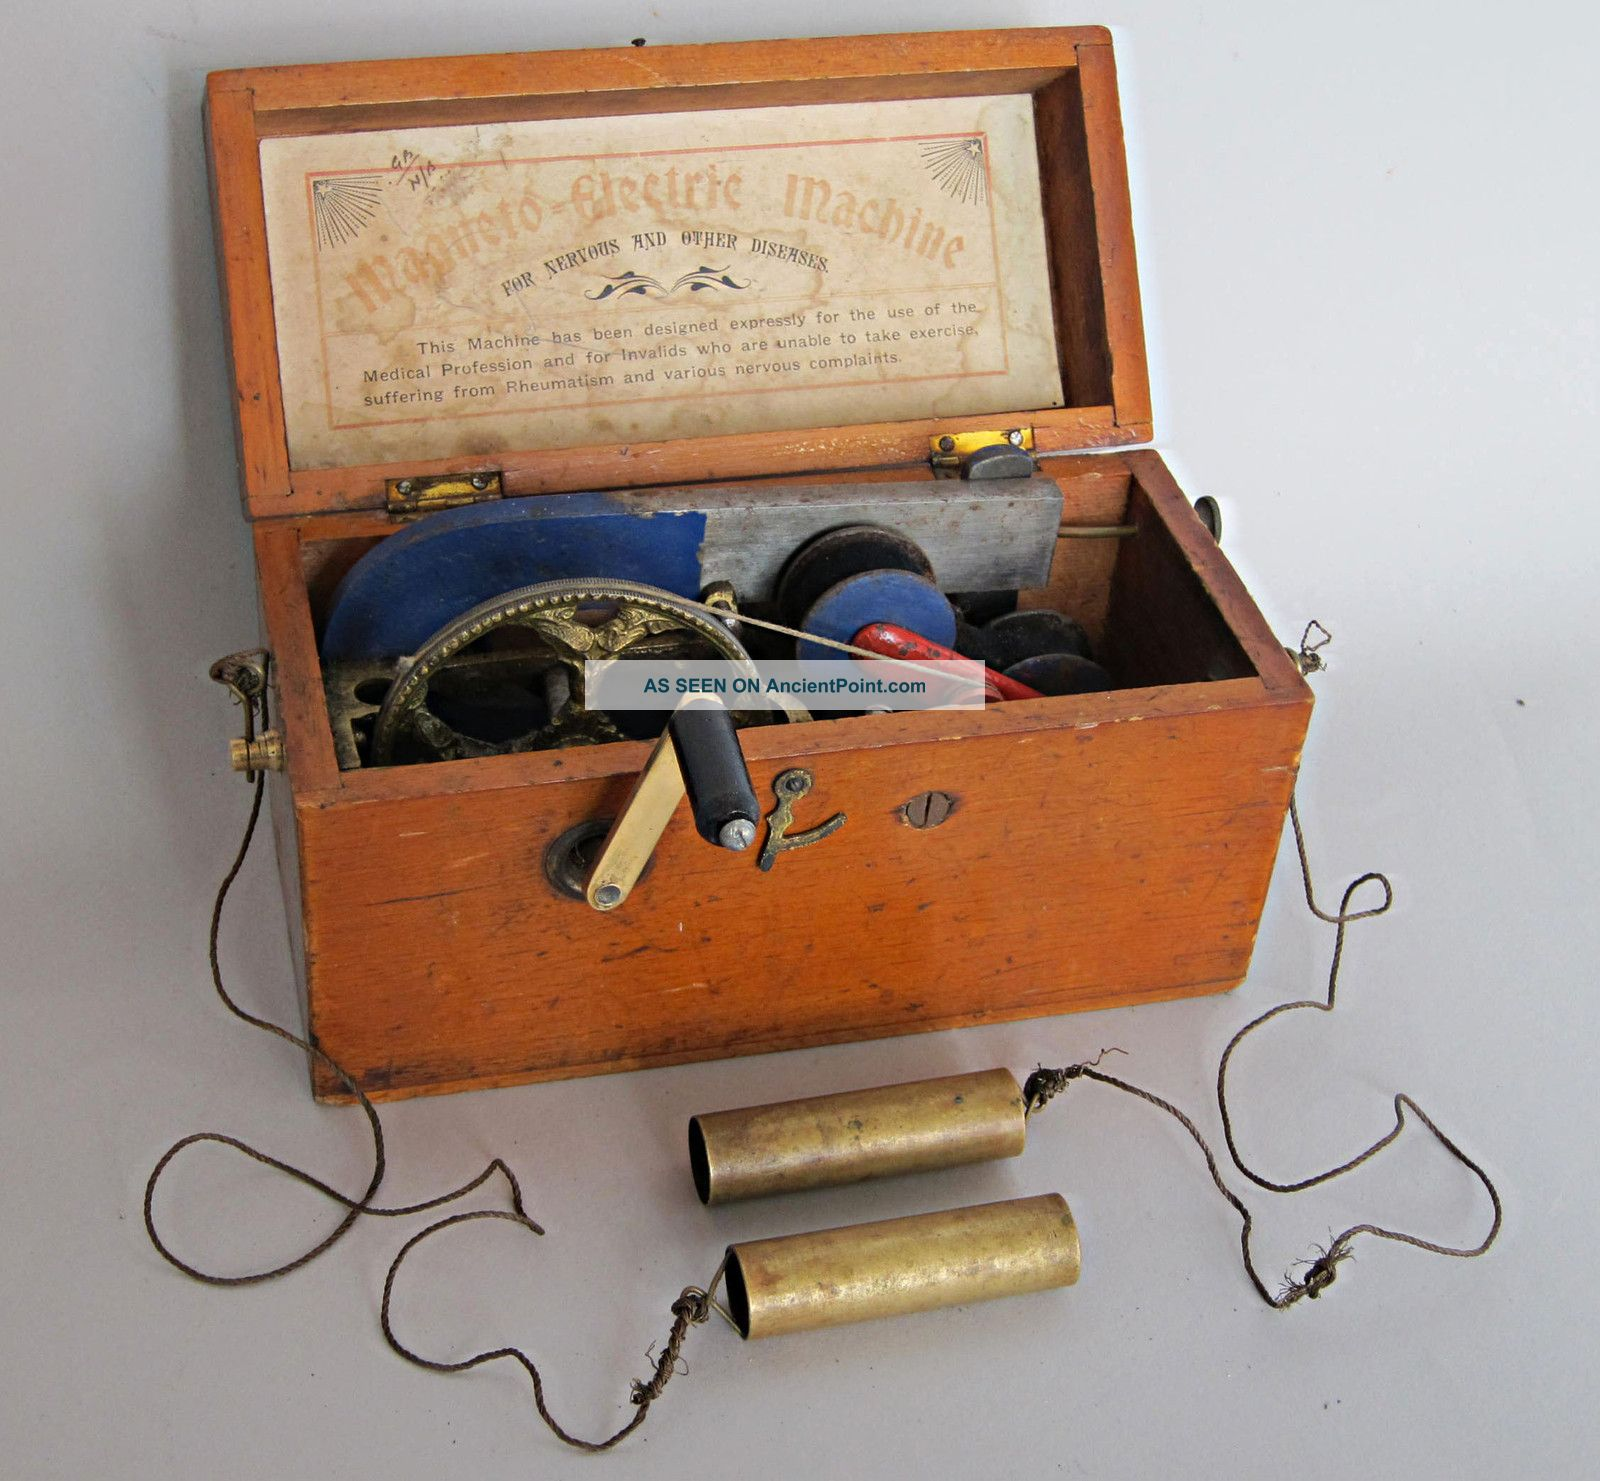 electric shock machine